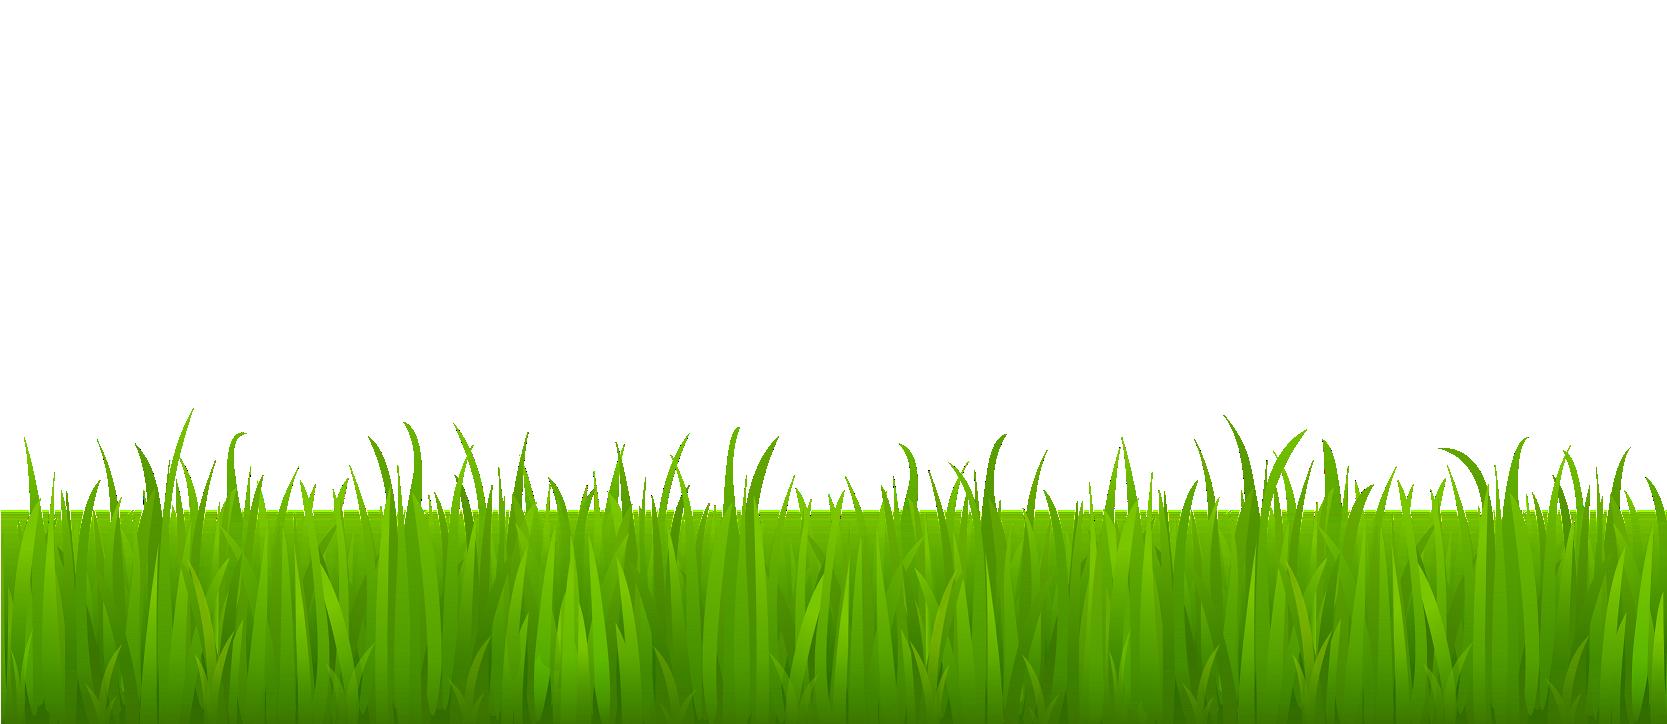 Lawn Desktop Wallpaper Clip art.